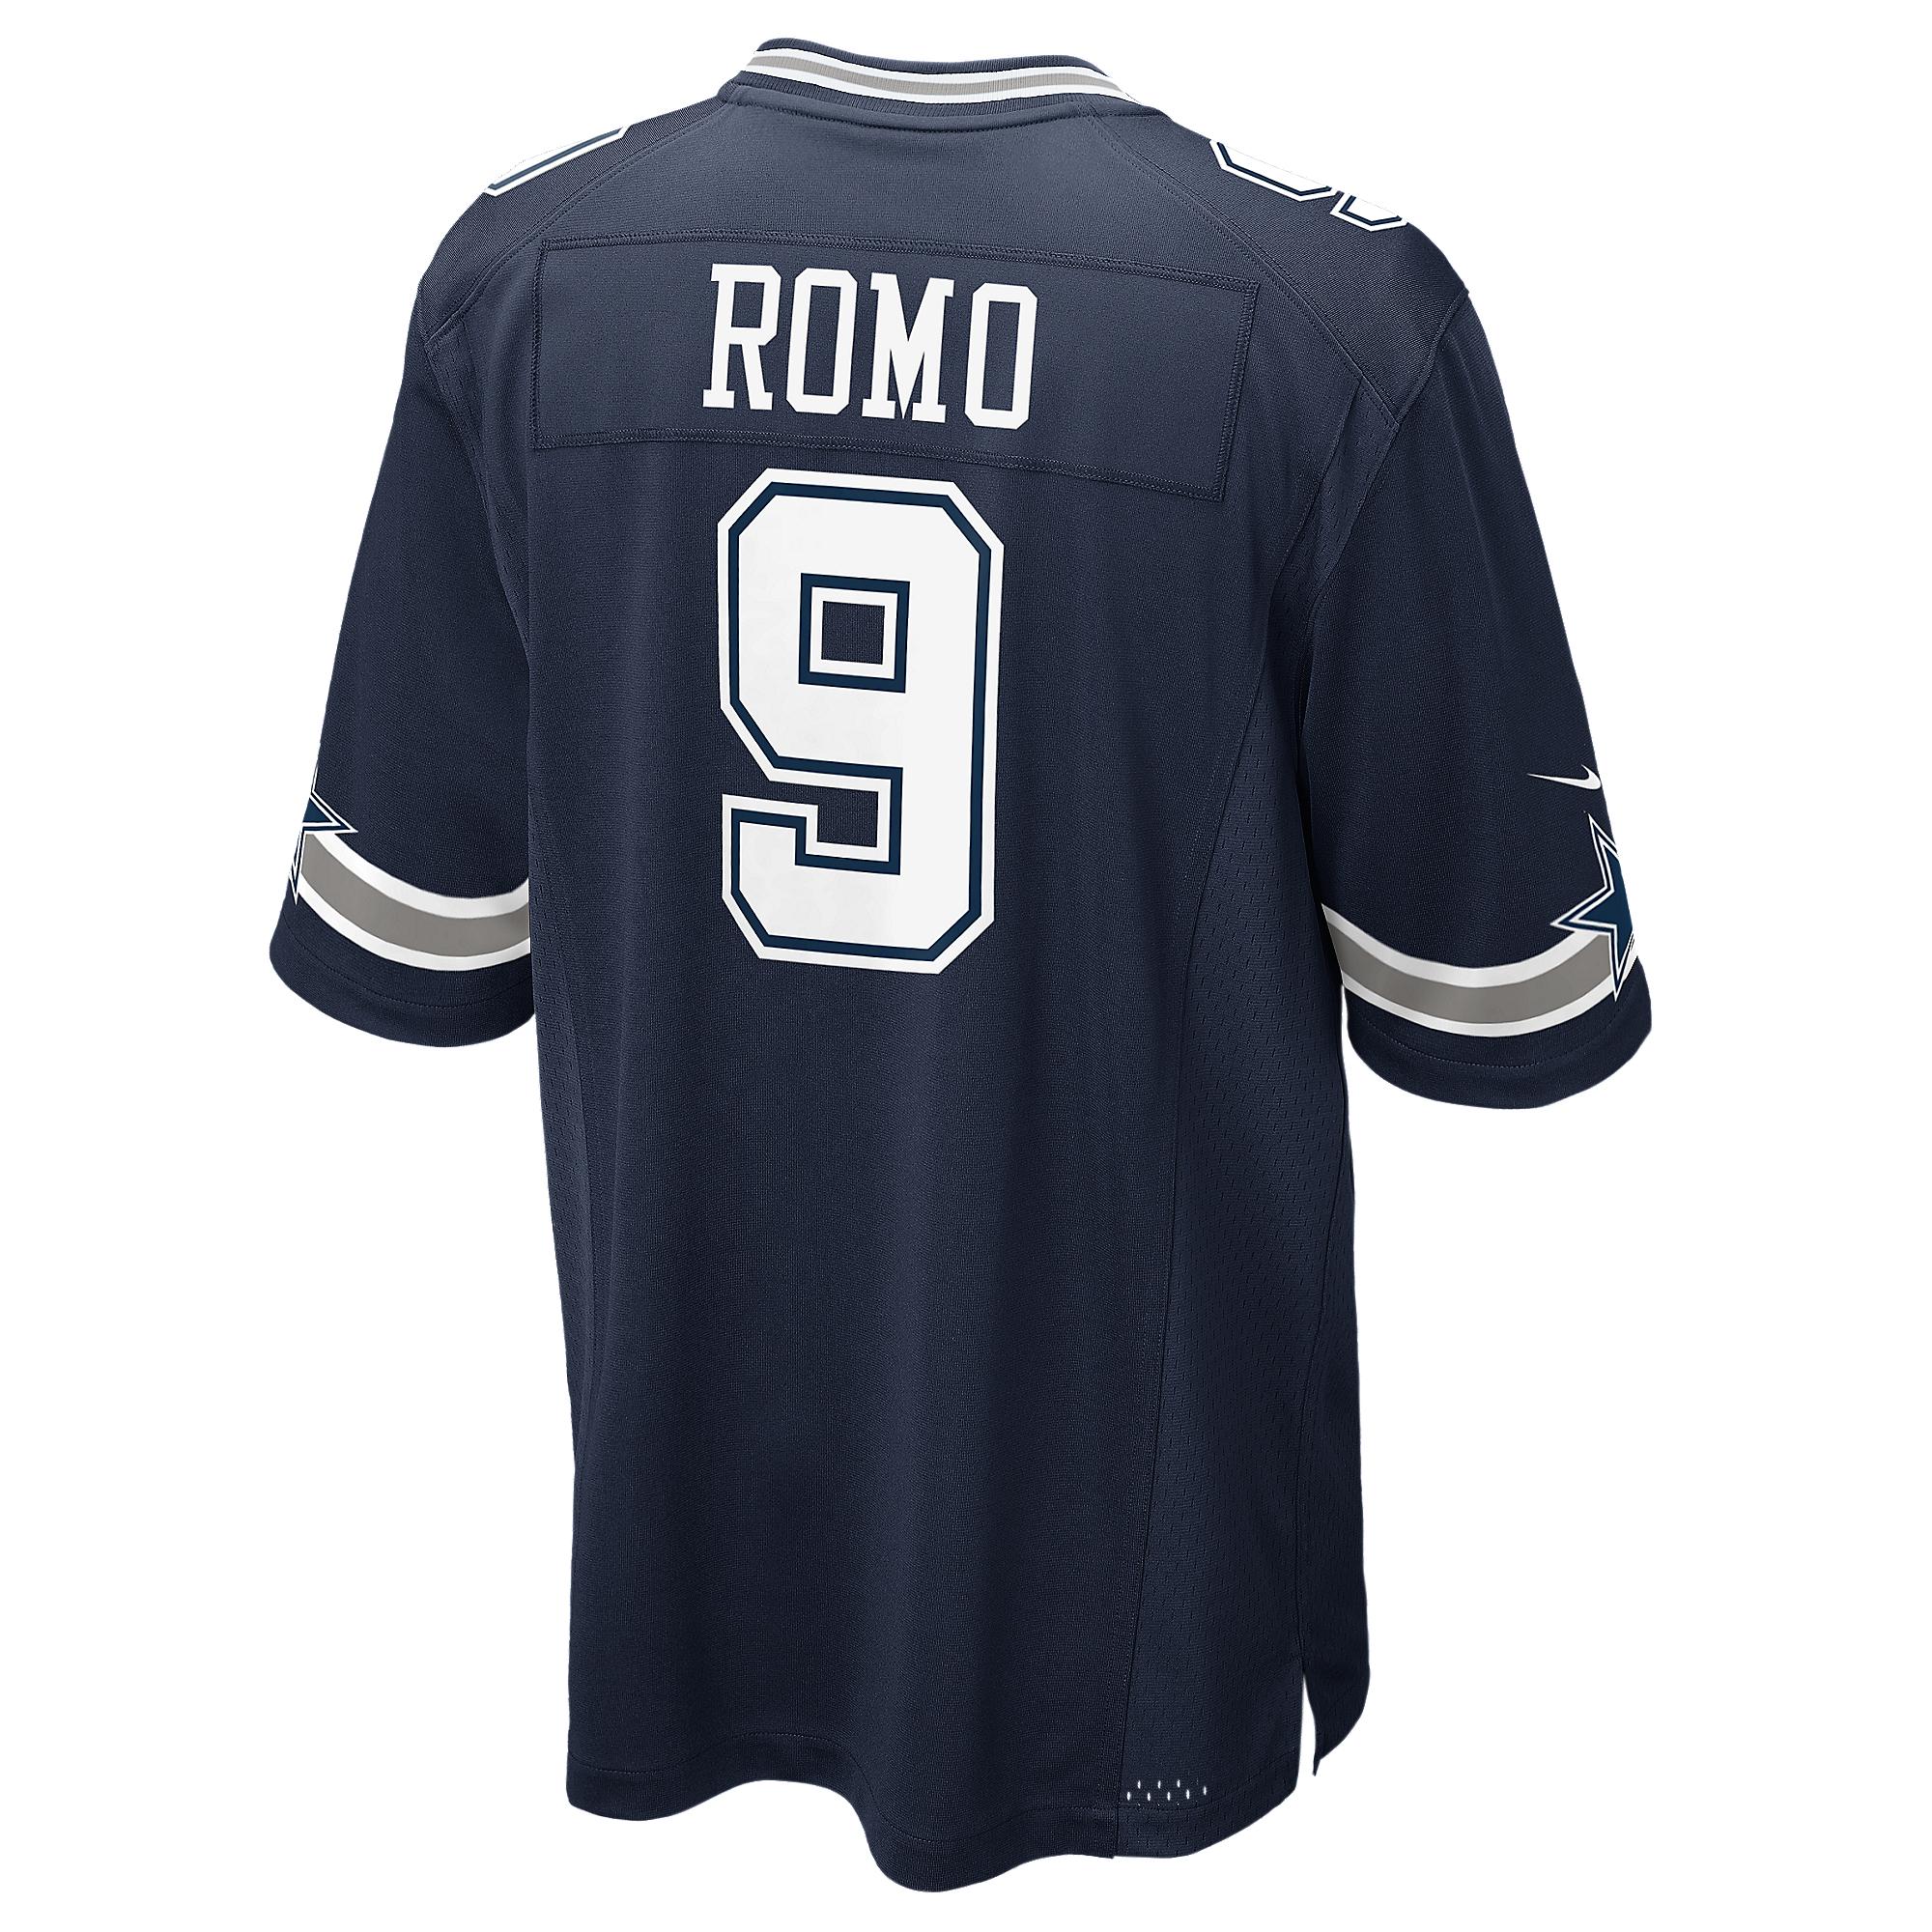 Dallas Cowboys Tony Romo  9 Nike Navy Game Replica Jersey  fce7f3a0f